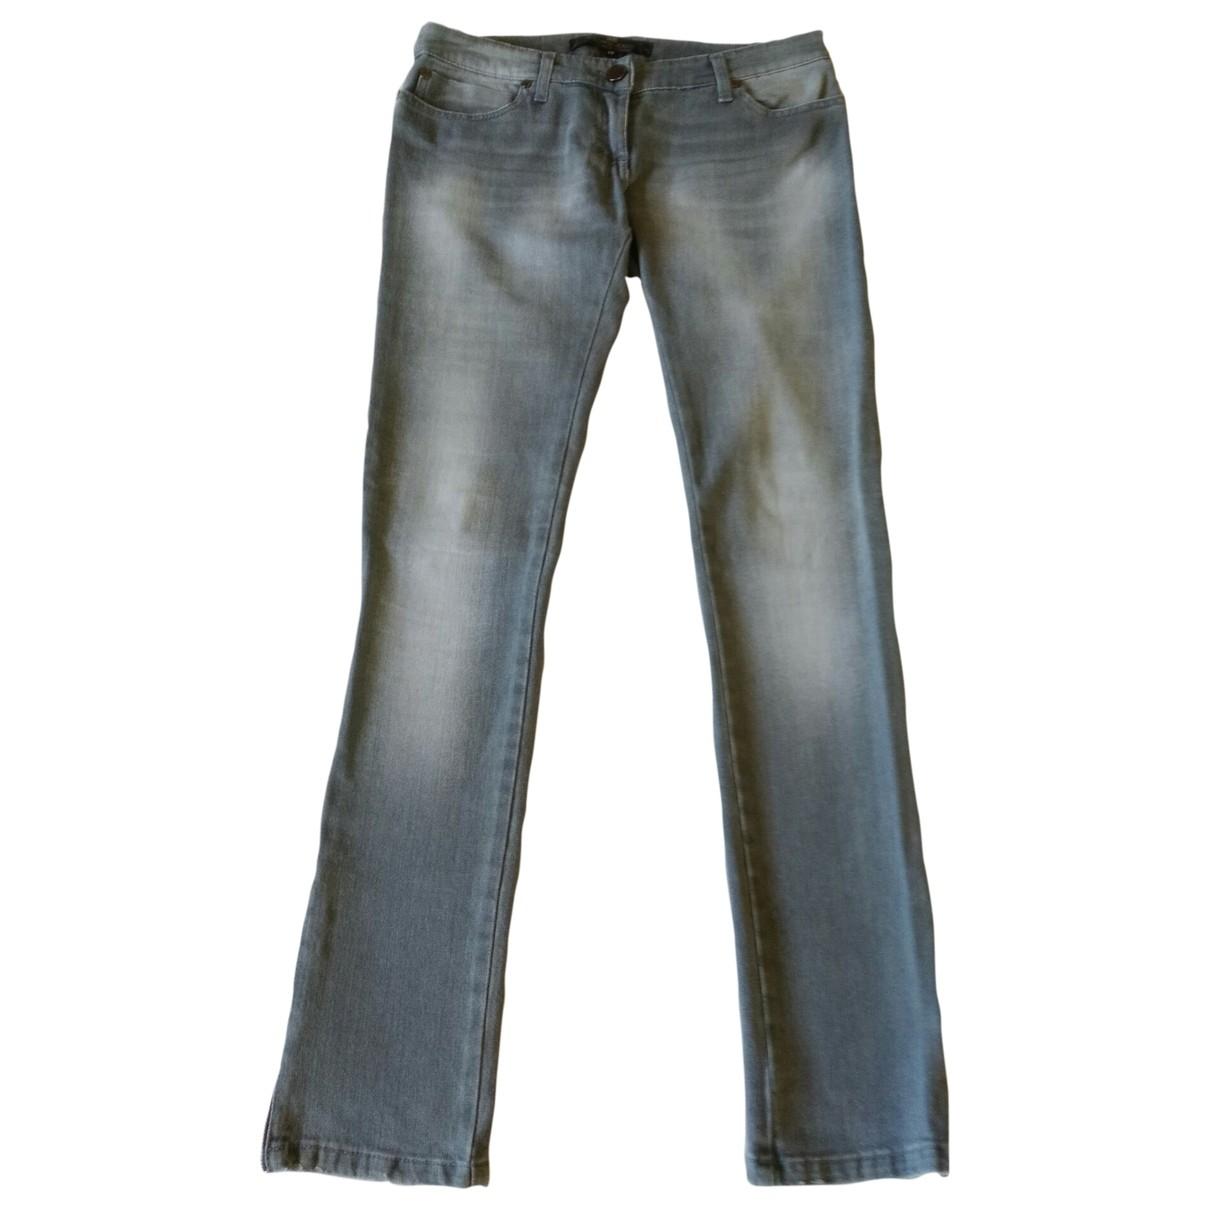 Elisabetta Franchi \N Grey Cotton - elasthane Jeans for Women 29 US